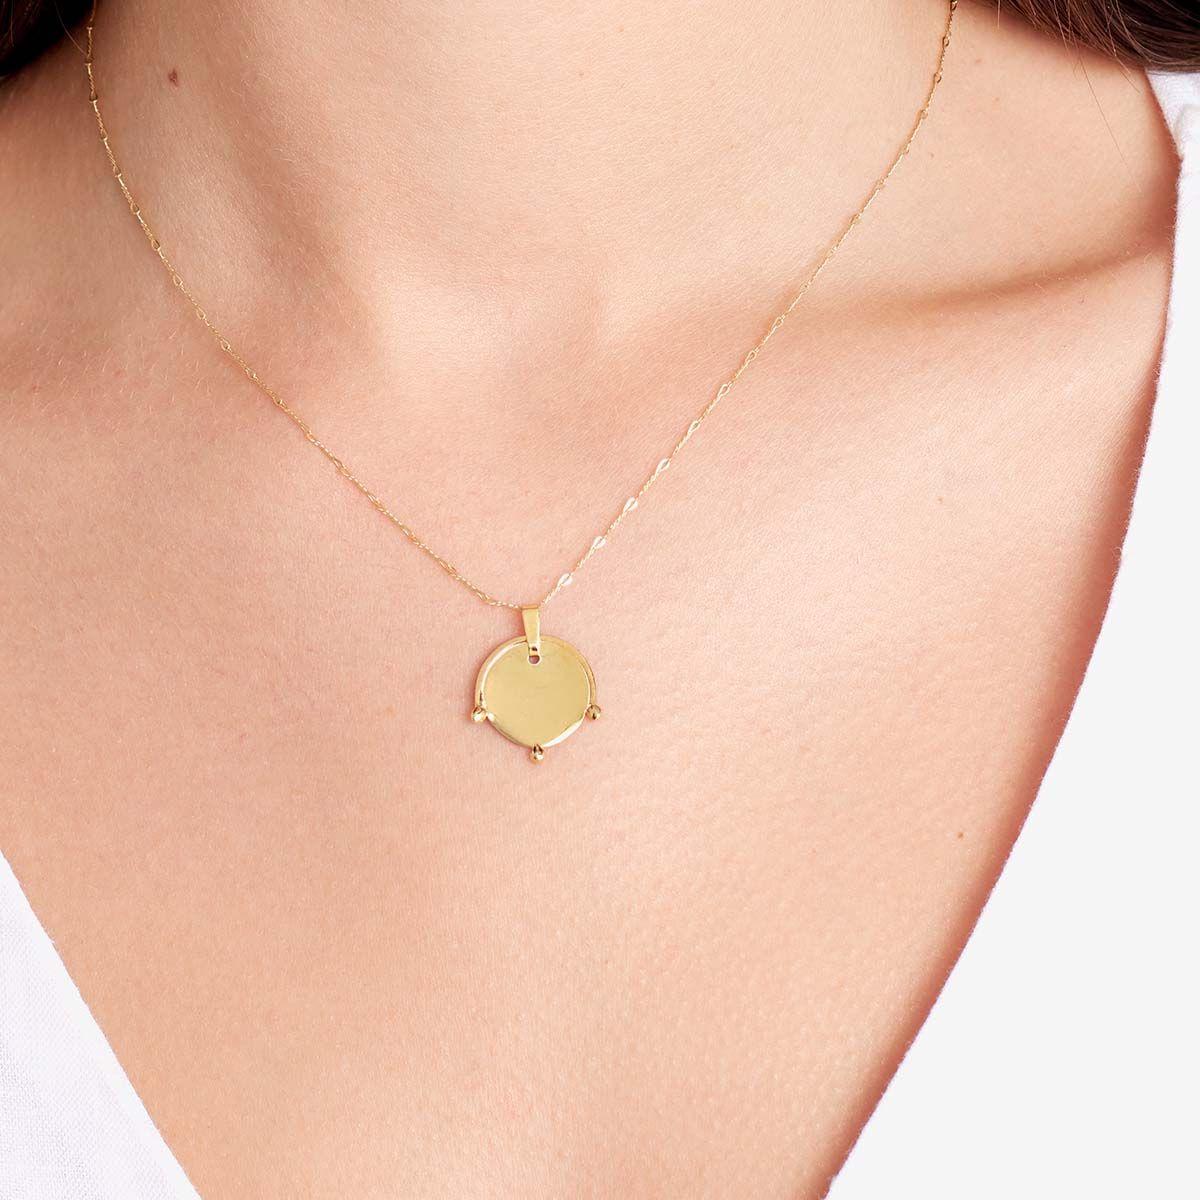 Stella - Halsketten - 18k vergoldet